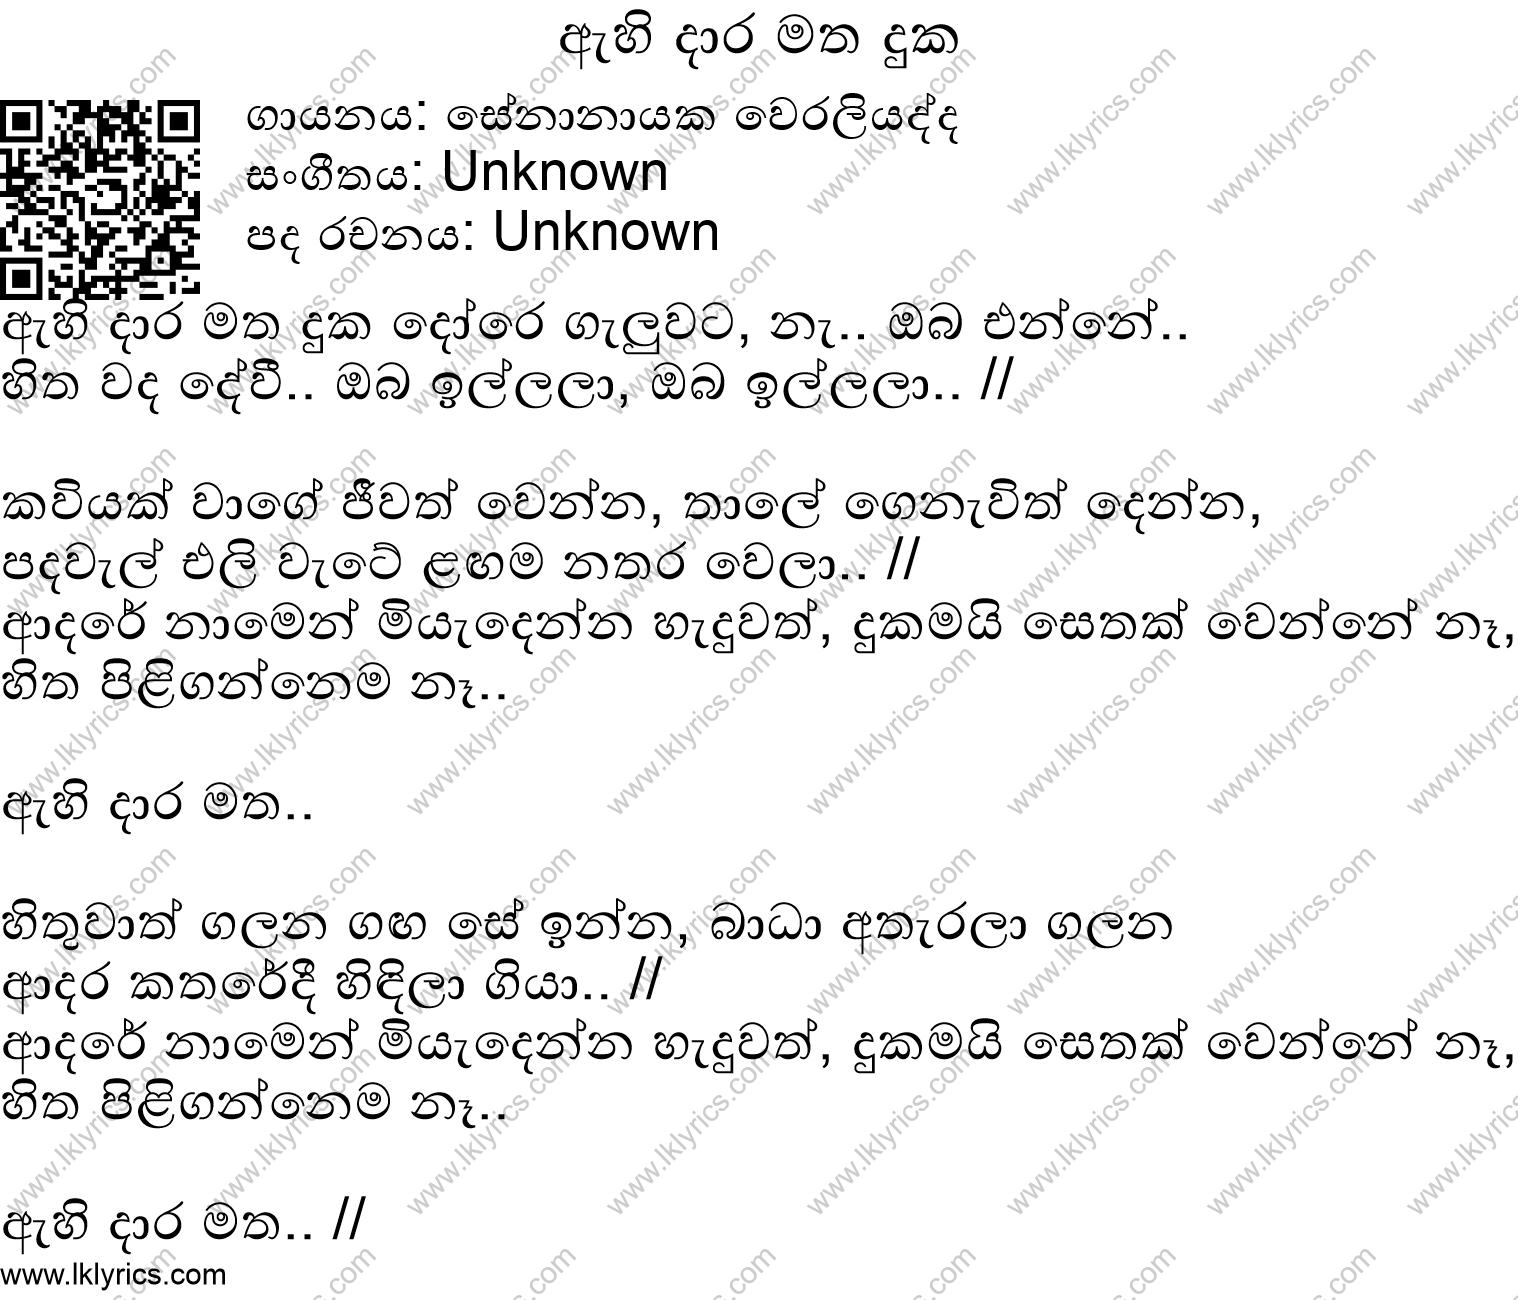 duka thada karan mp3 free download